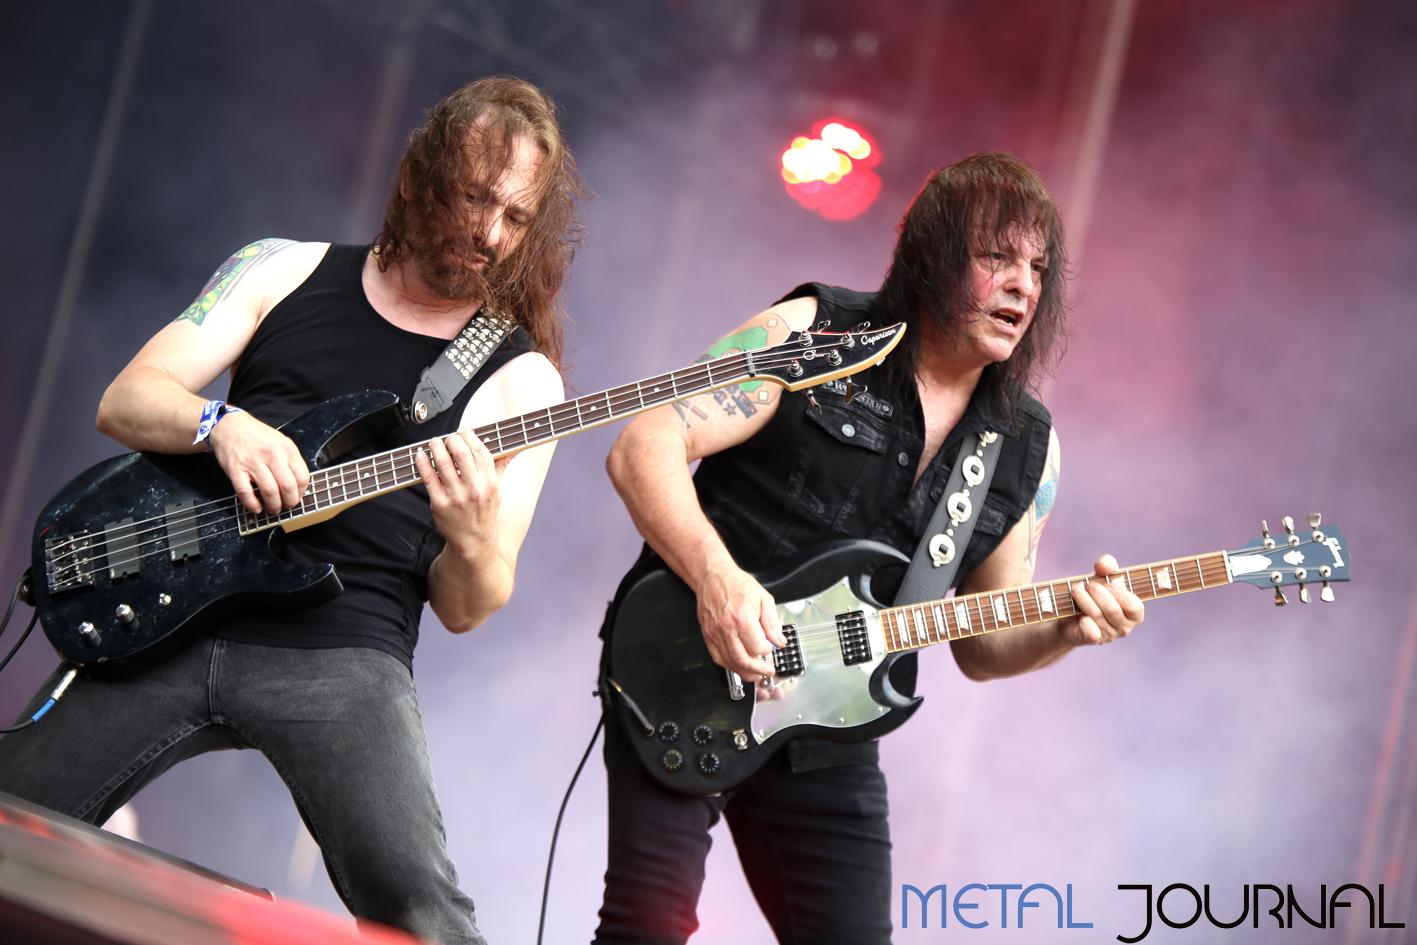 ross the boss rock fest 18 - metal journal pic 4